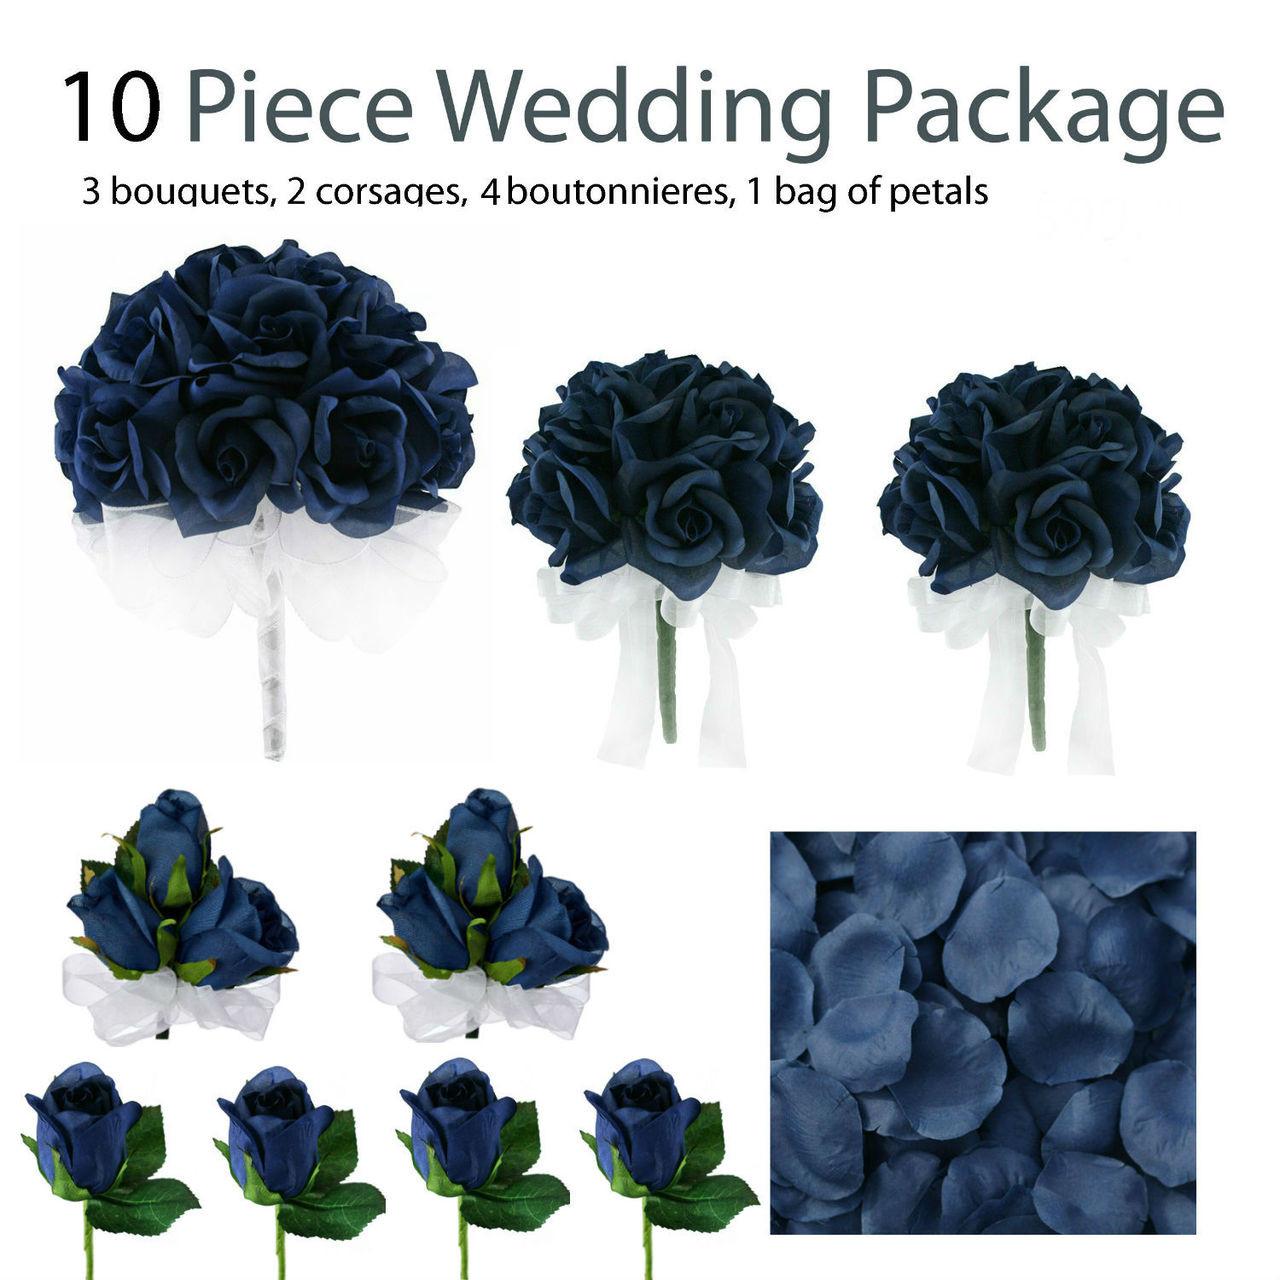 10 Piece Navy Blue Silk Wedding Flower Package Navy Blue Rose Silk